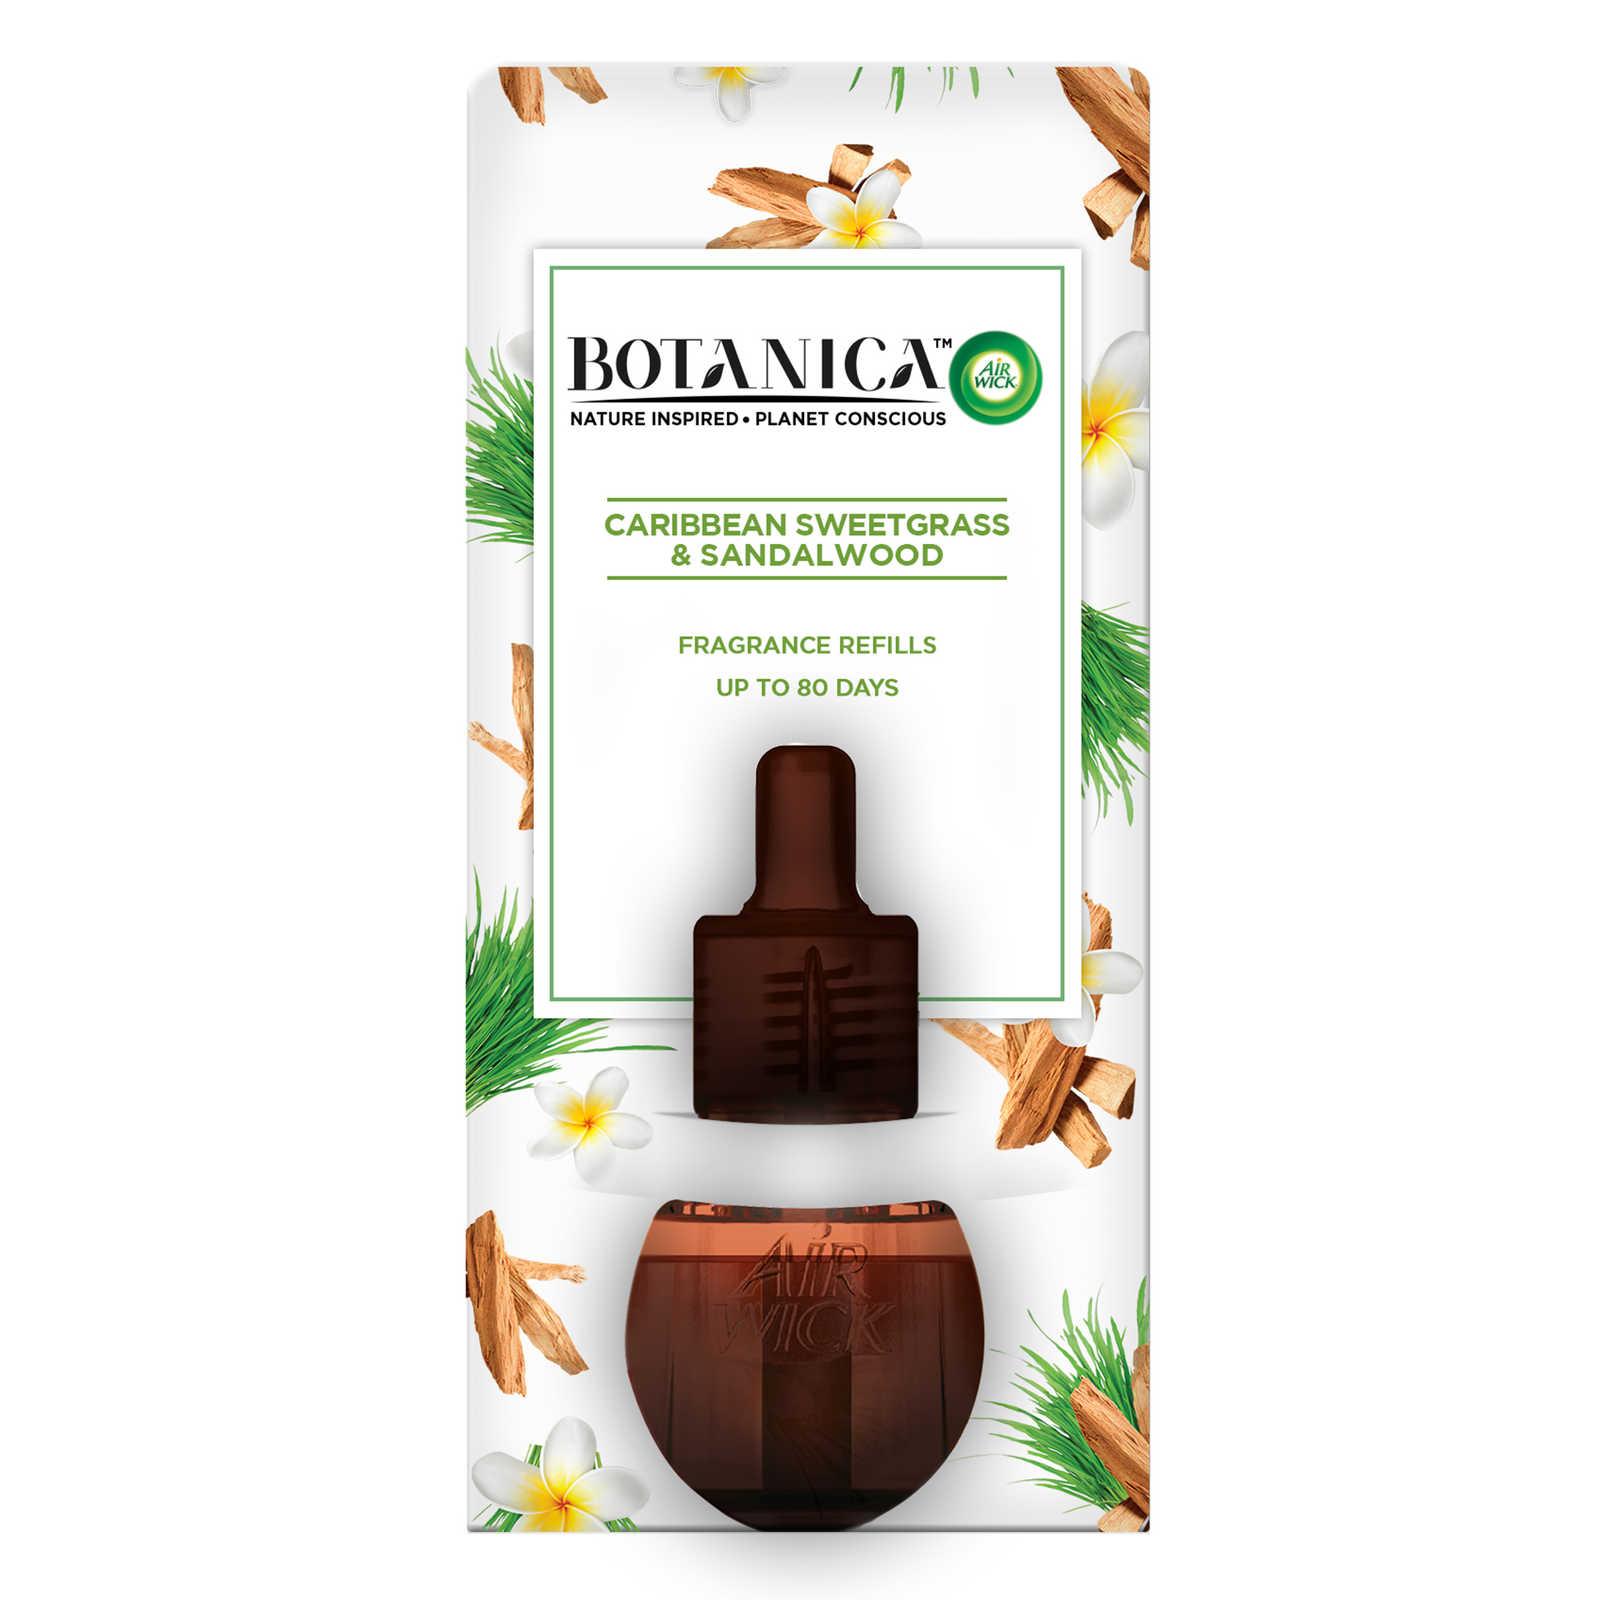 Air Wick-Botanica